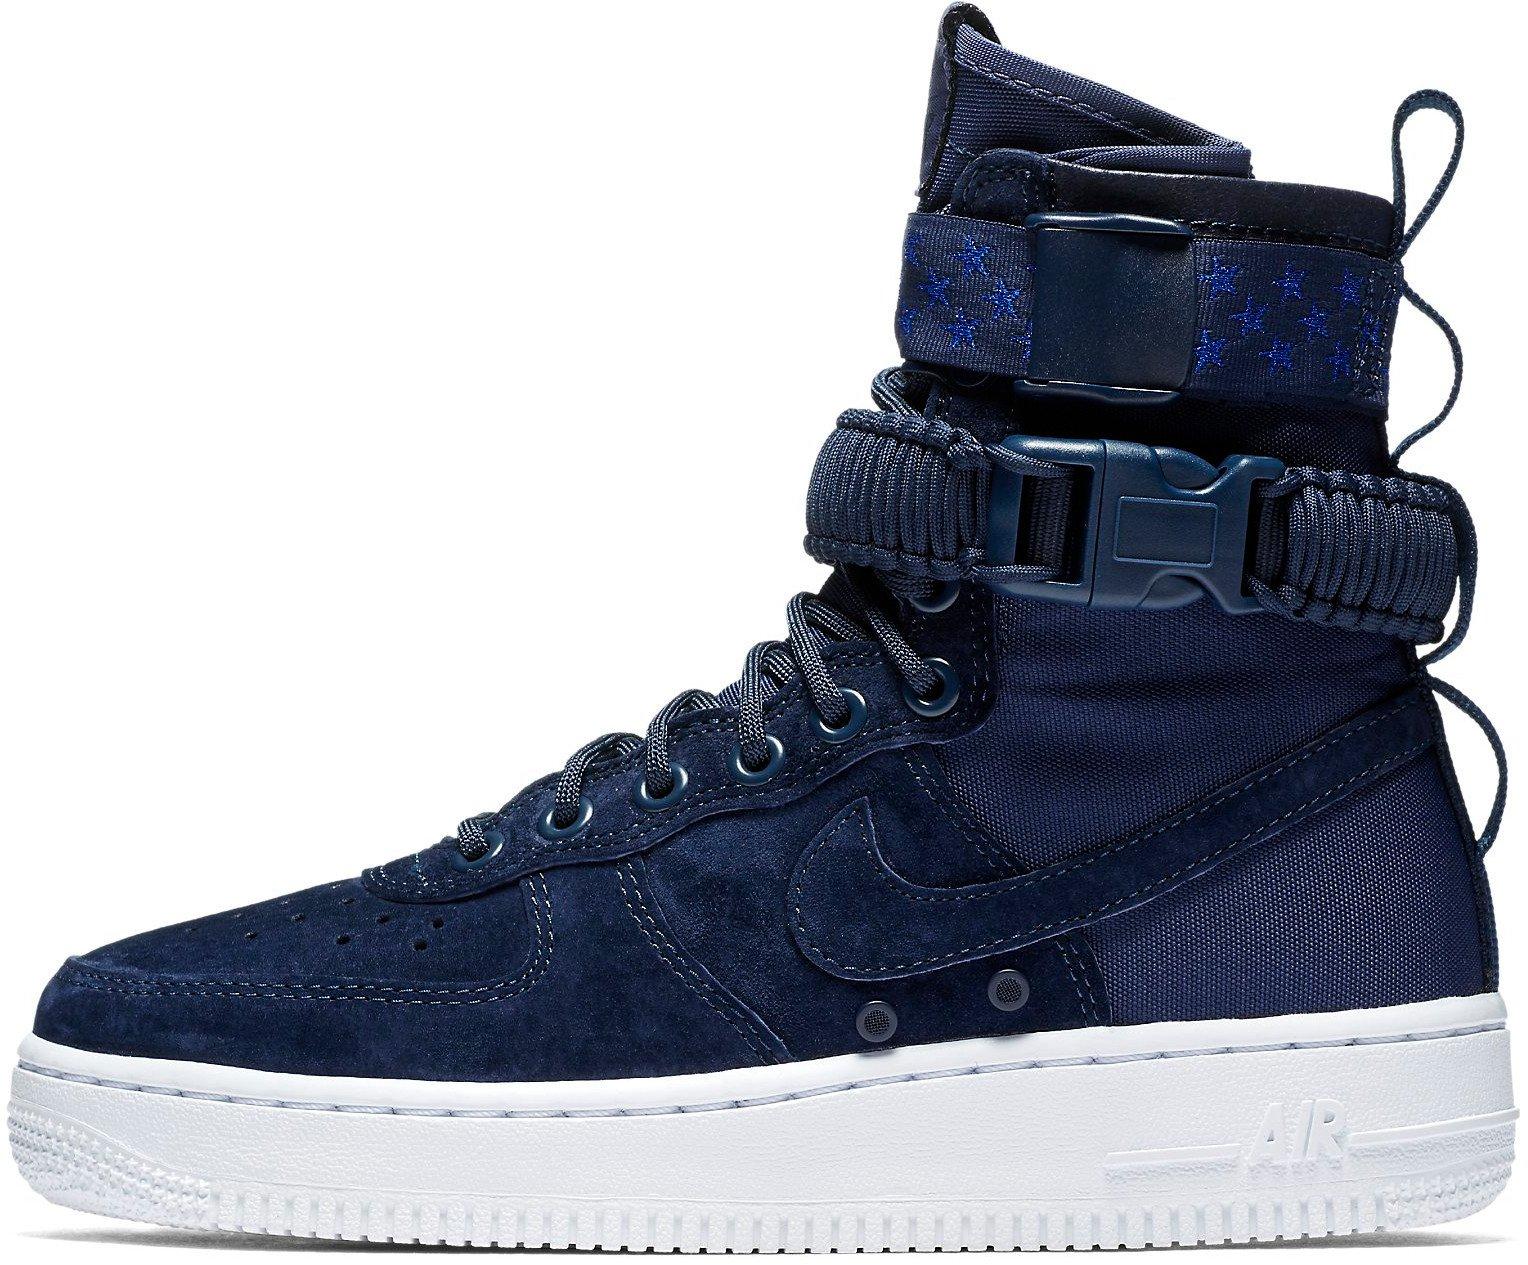 Shoes Nike W SF AF1 - Top4Running.com